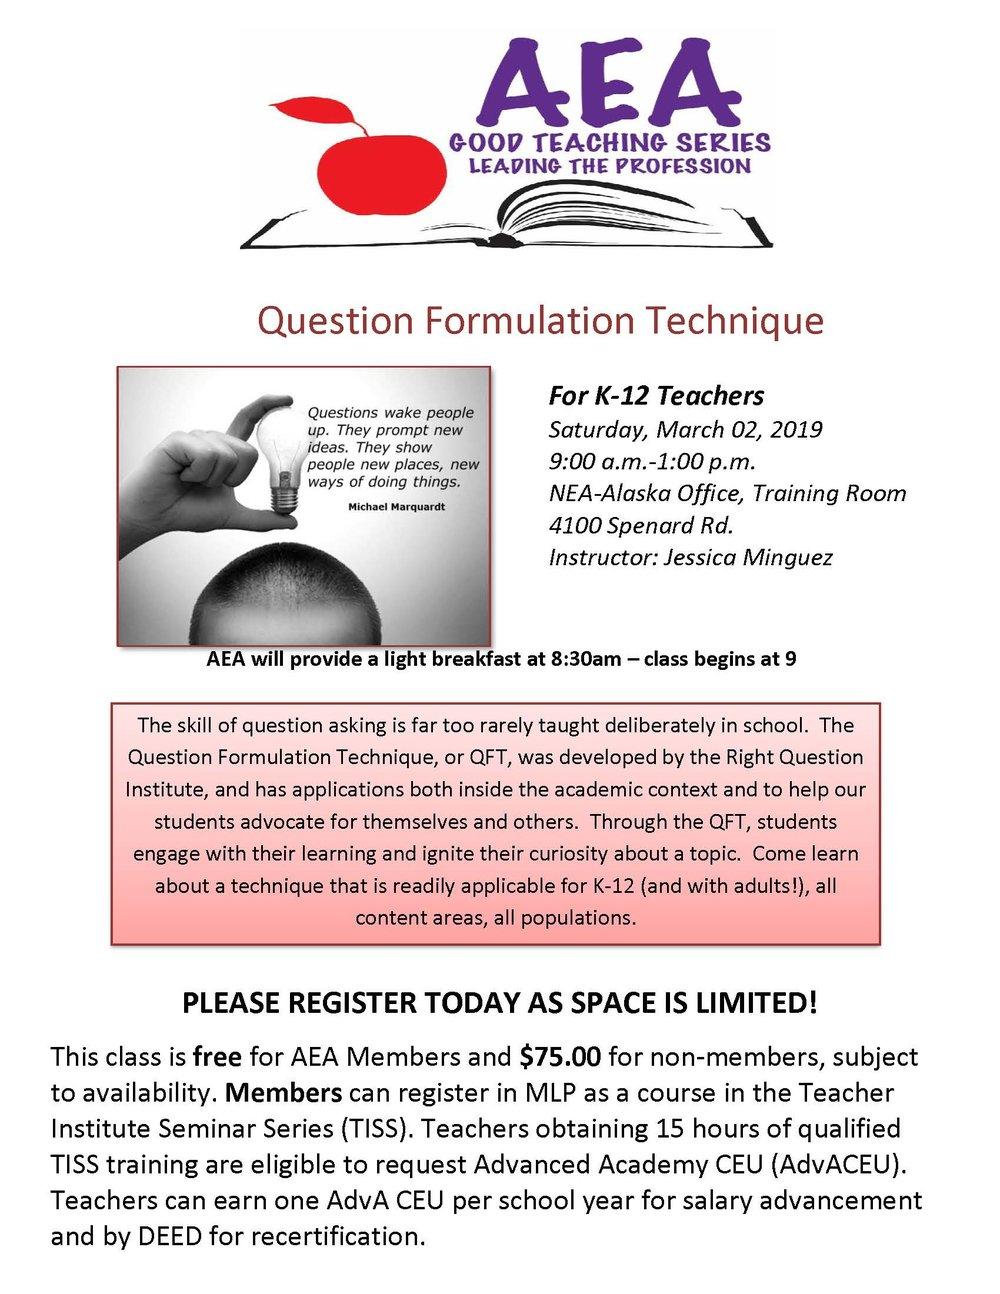 PD Class Flyer Mar 02_Question Formulation Technique.jpg